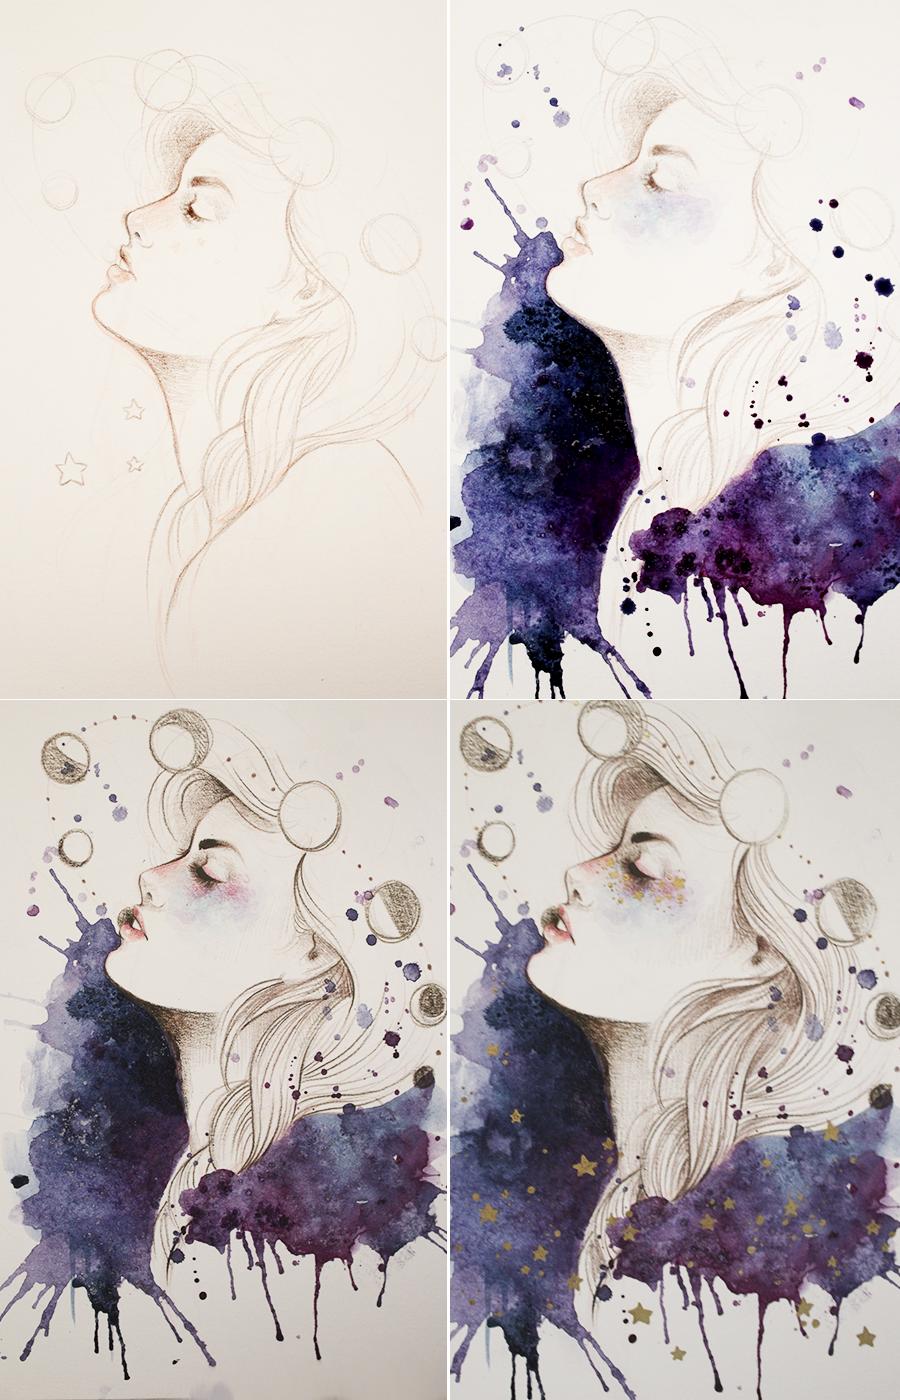 ilustracao-galaxia-juliana-rabelo-01